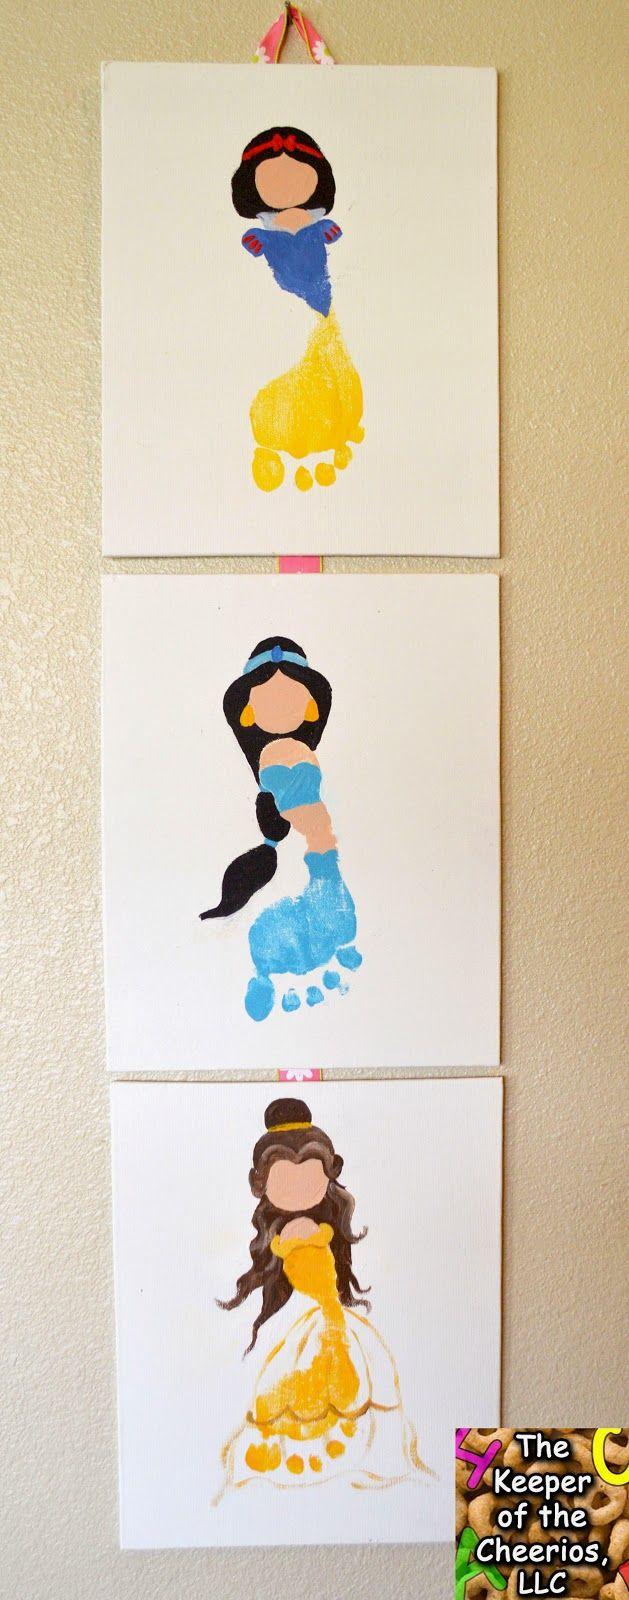 Princess Footprints #2 ...Snow White Footprint, Jasmine Footprint (Aladdin Footprint), Belle Footprint (Beauty and the Beast Footprint) Disney